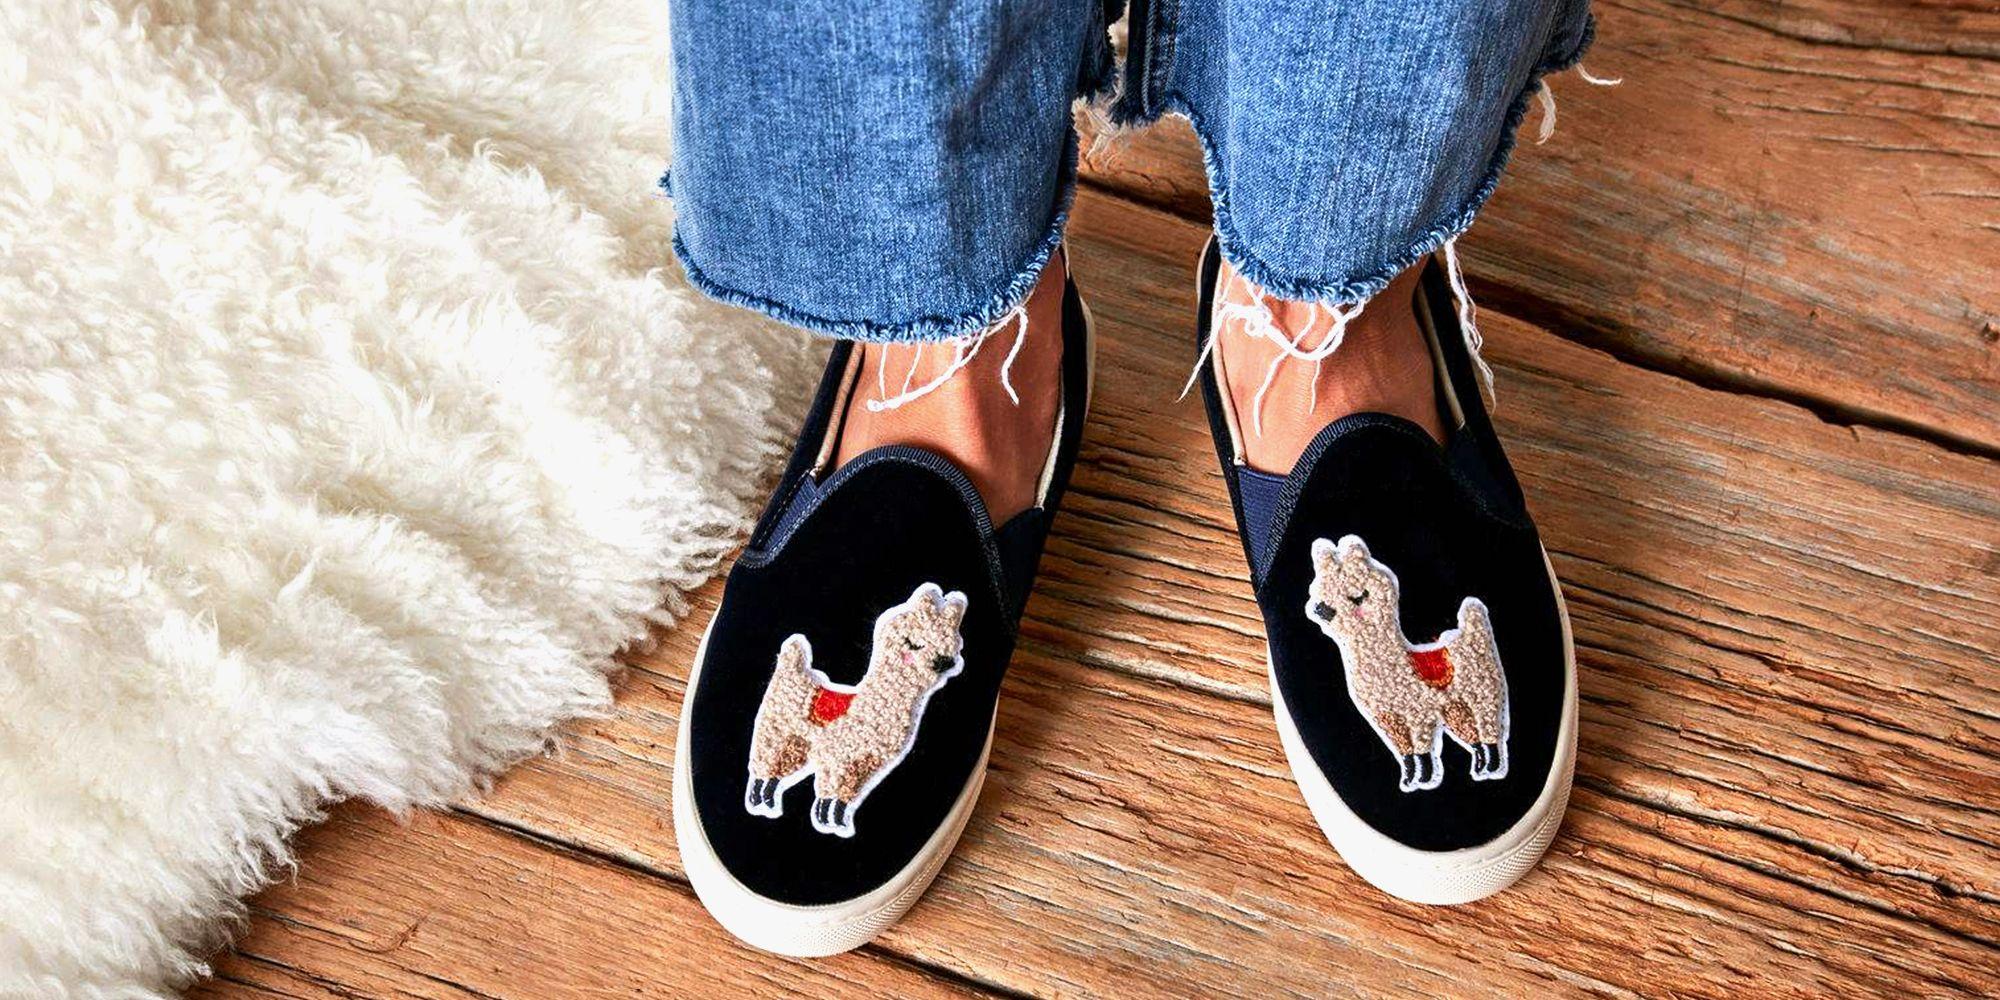 12 Best Slip On Sneakers for Women 2018